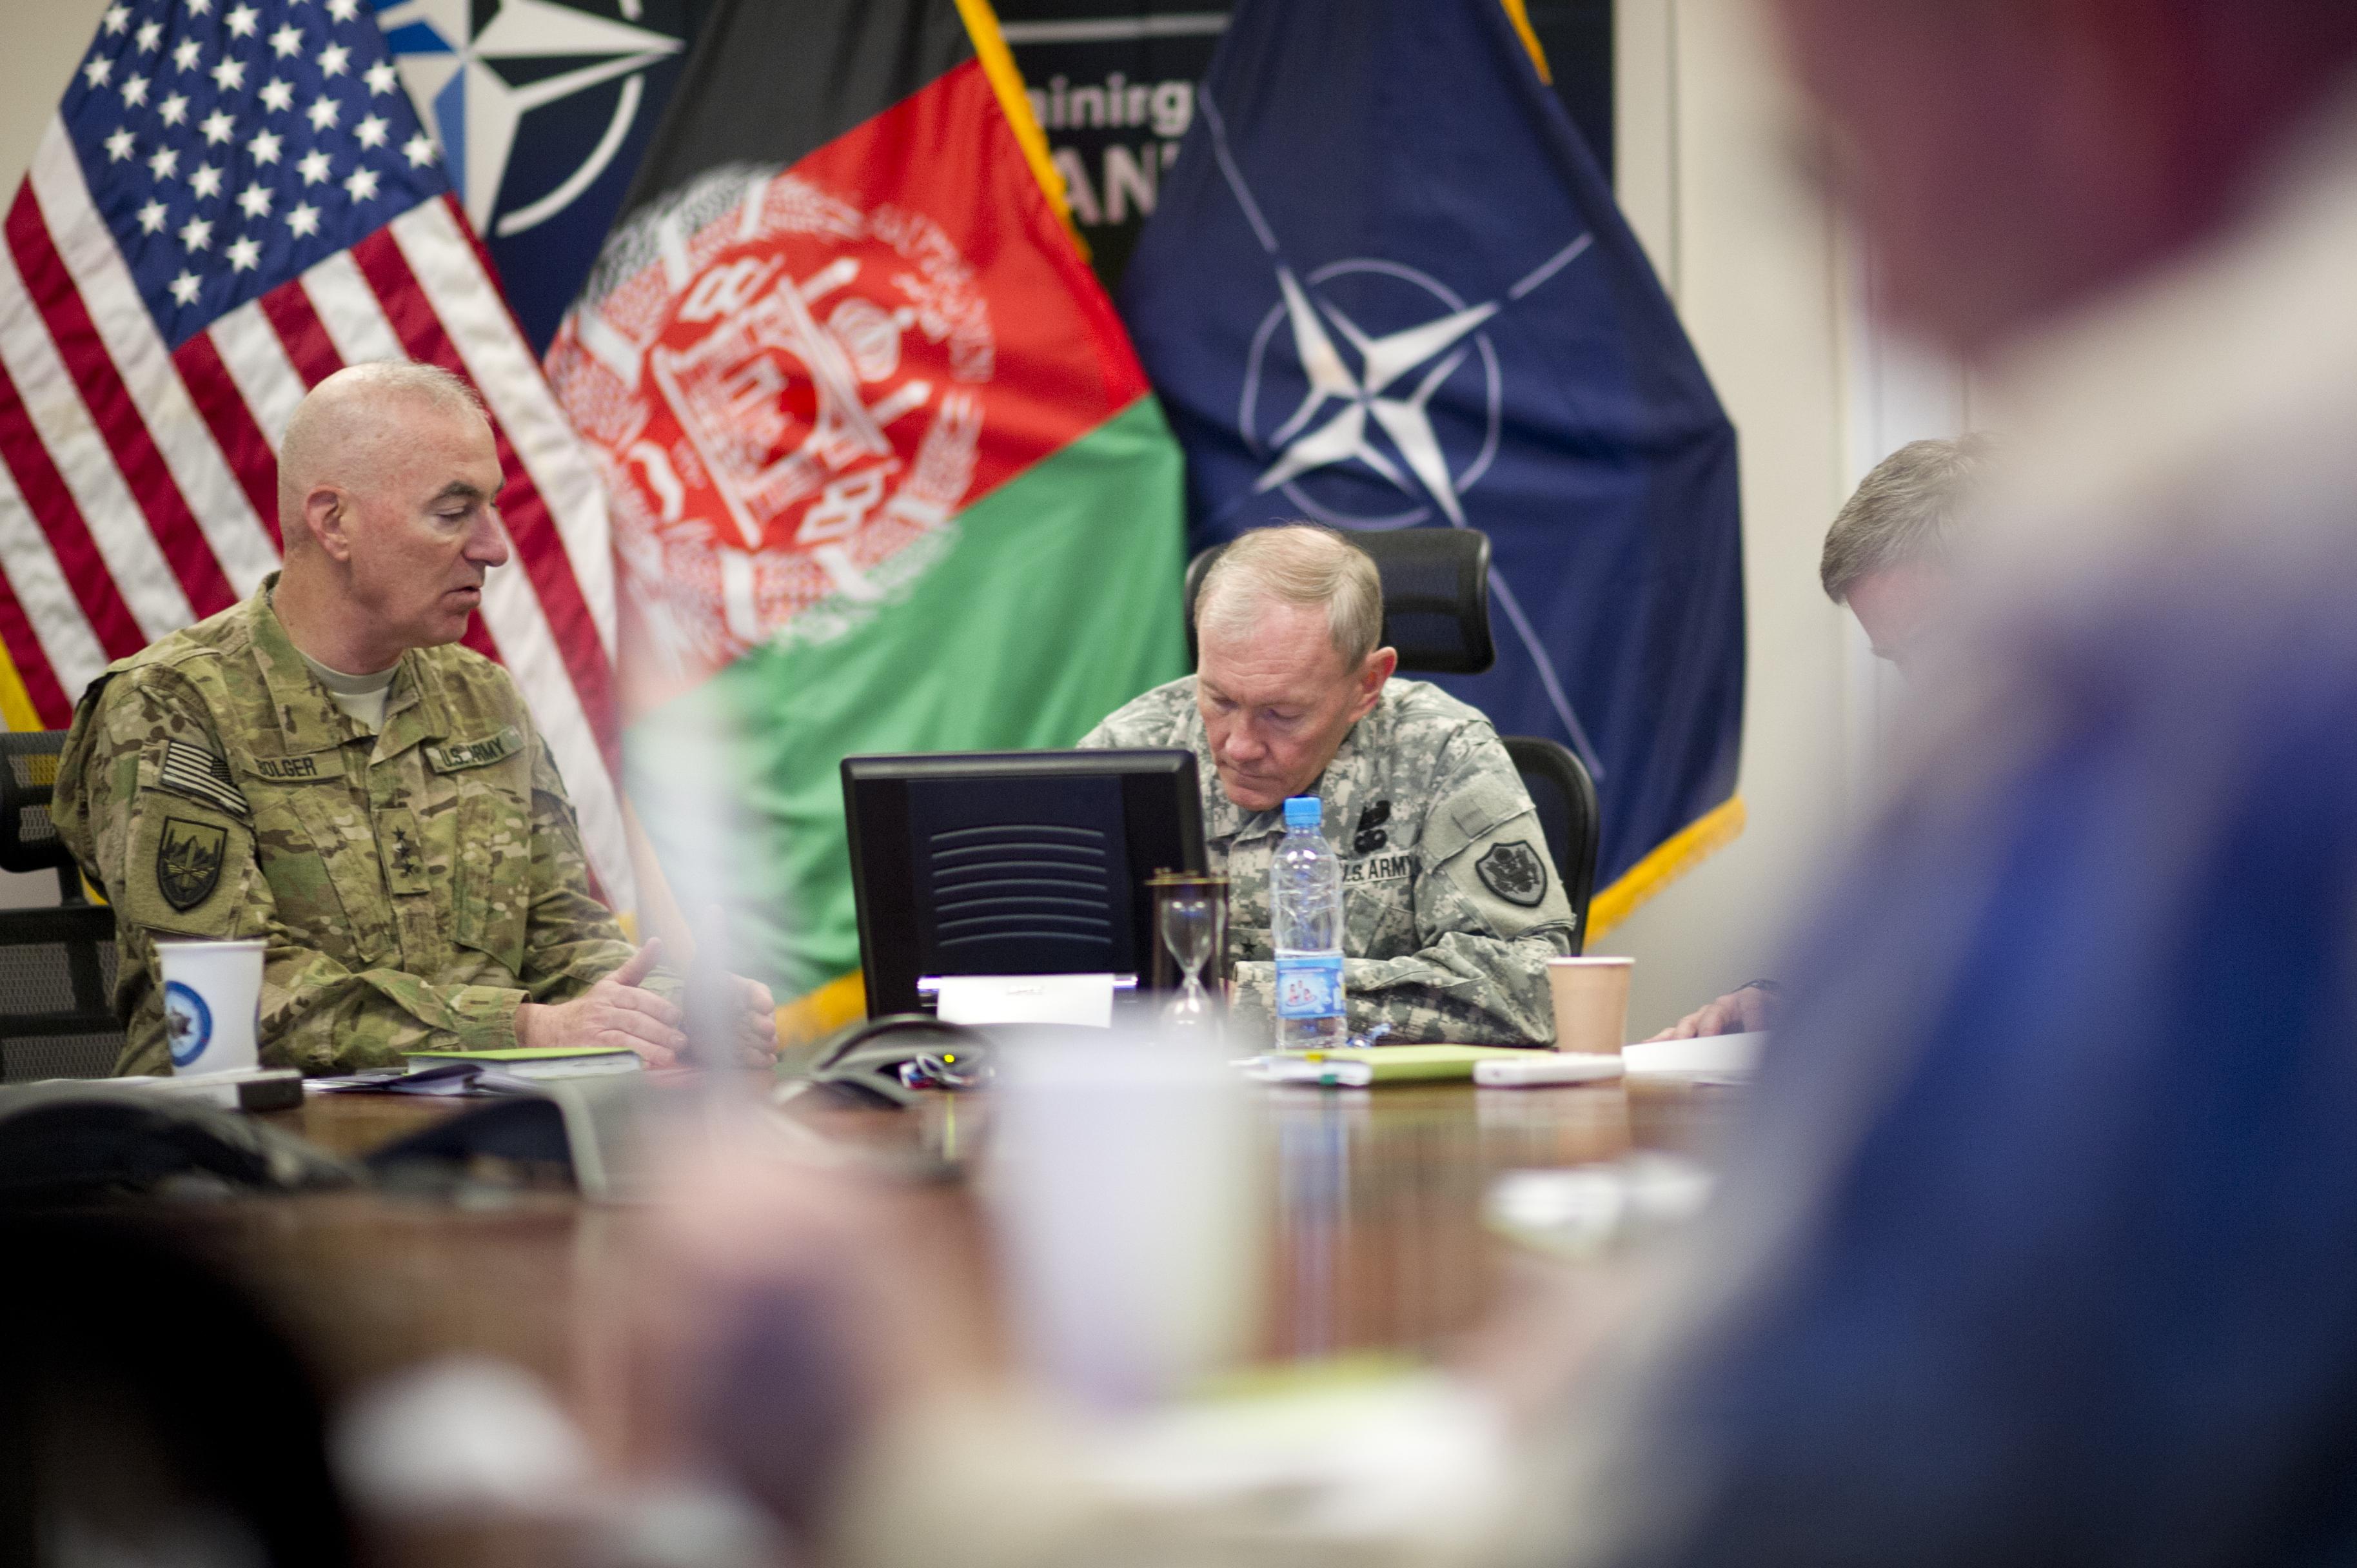 Army Lt. Gen. Daniel Bolger, left, briefs Gen. Martin Dempsey, chairman of the Joint Chiefs, on progress in Afghanistan in 2012.